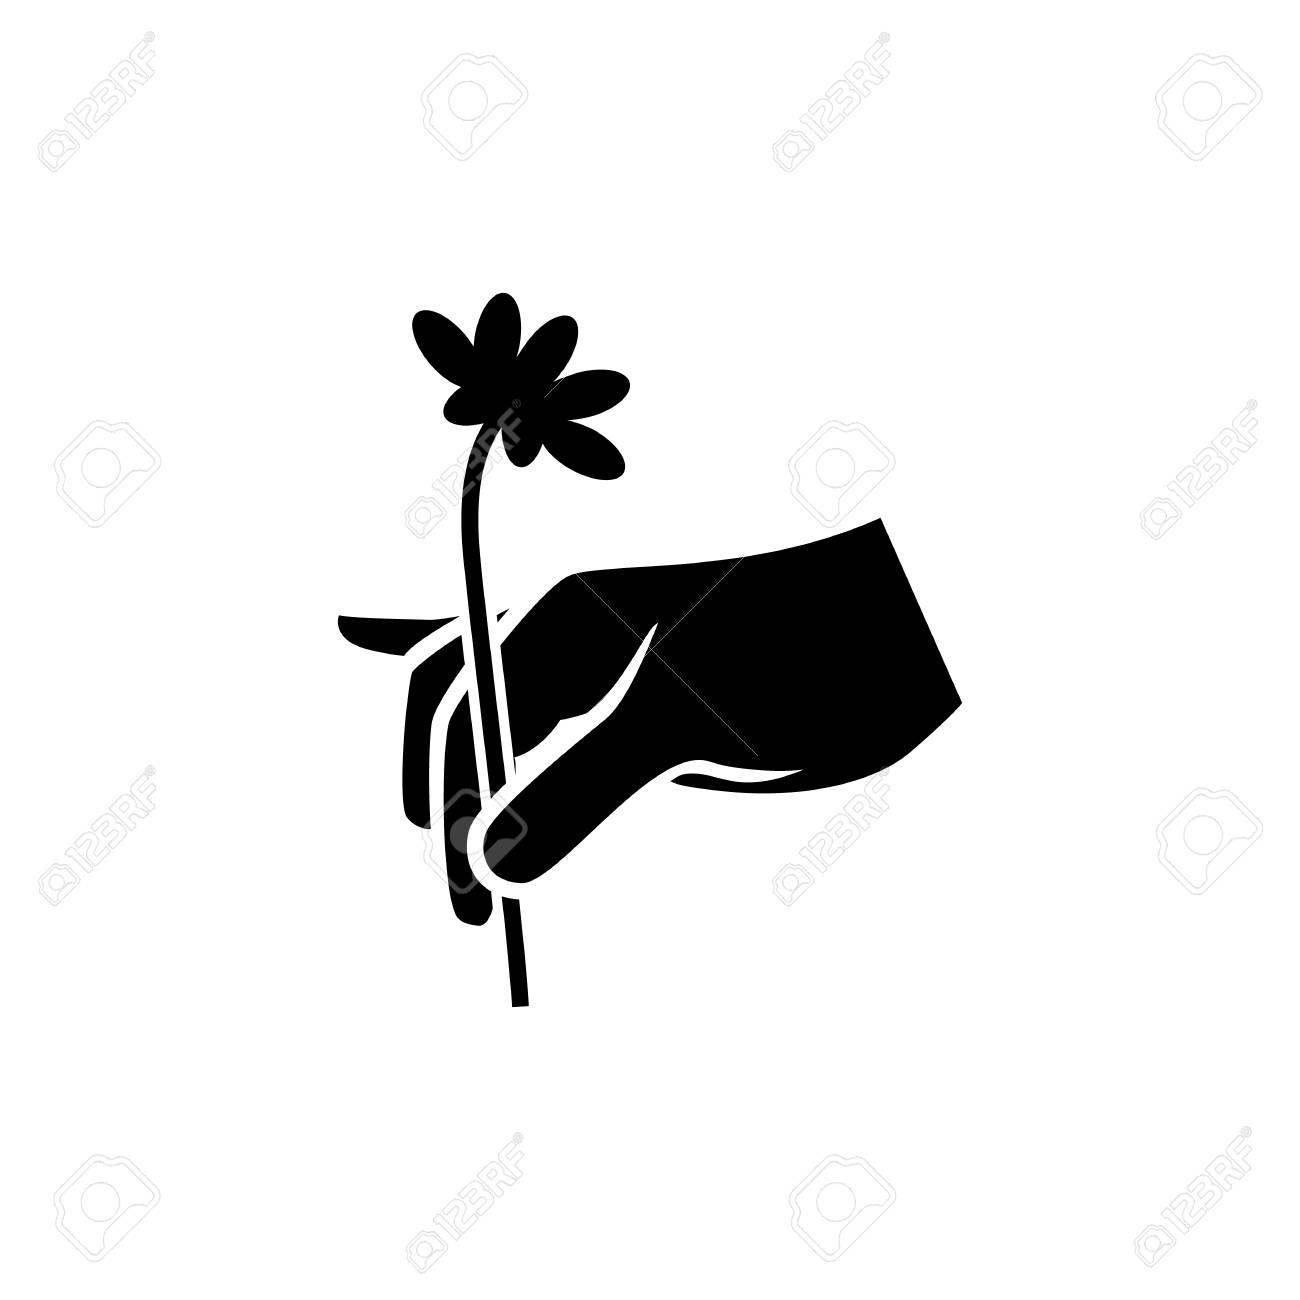 Black Silhouette Illustration Of Hand Picking A Flower Delicately